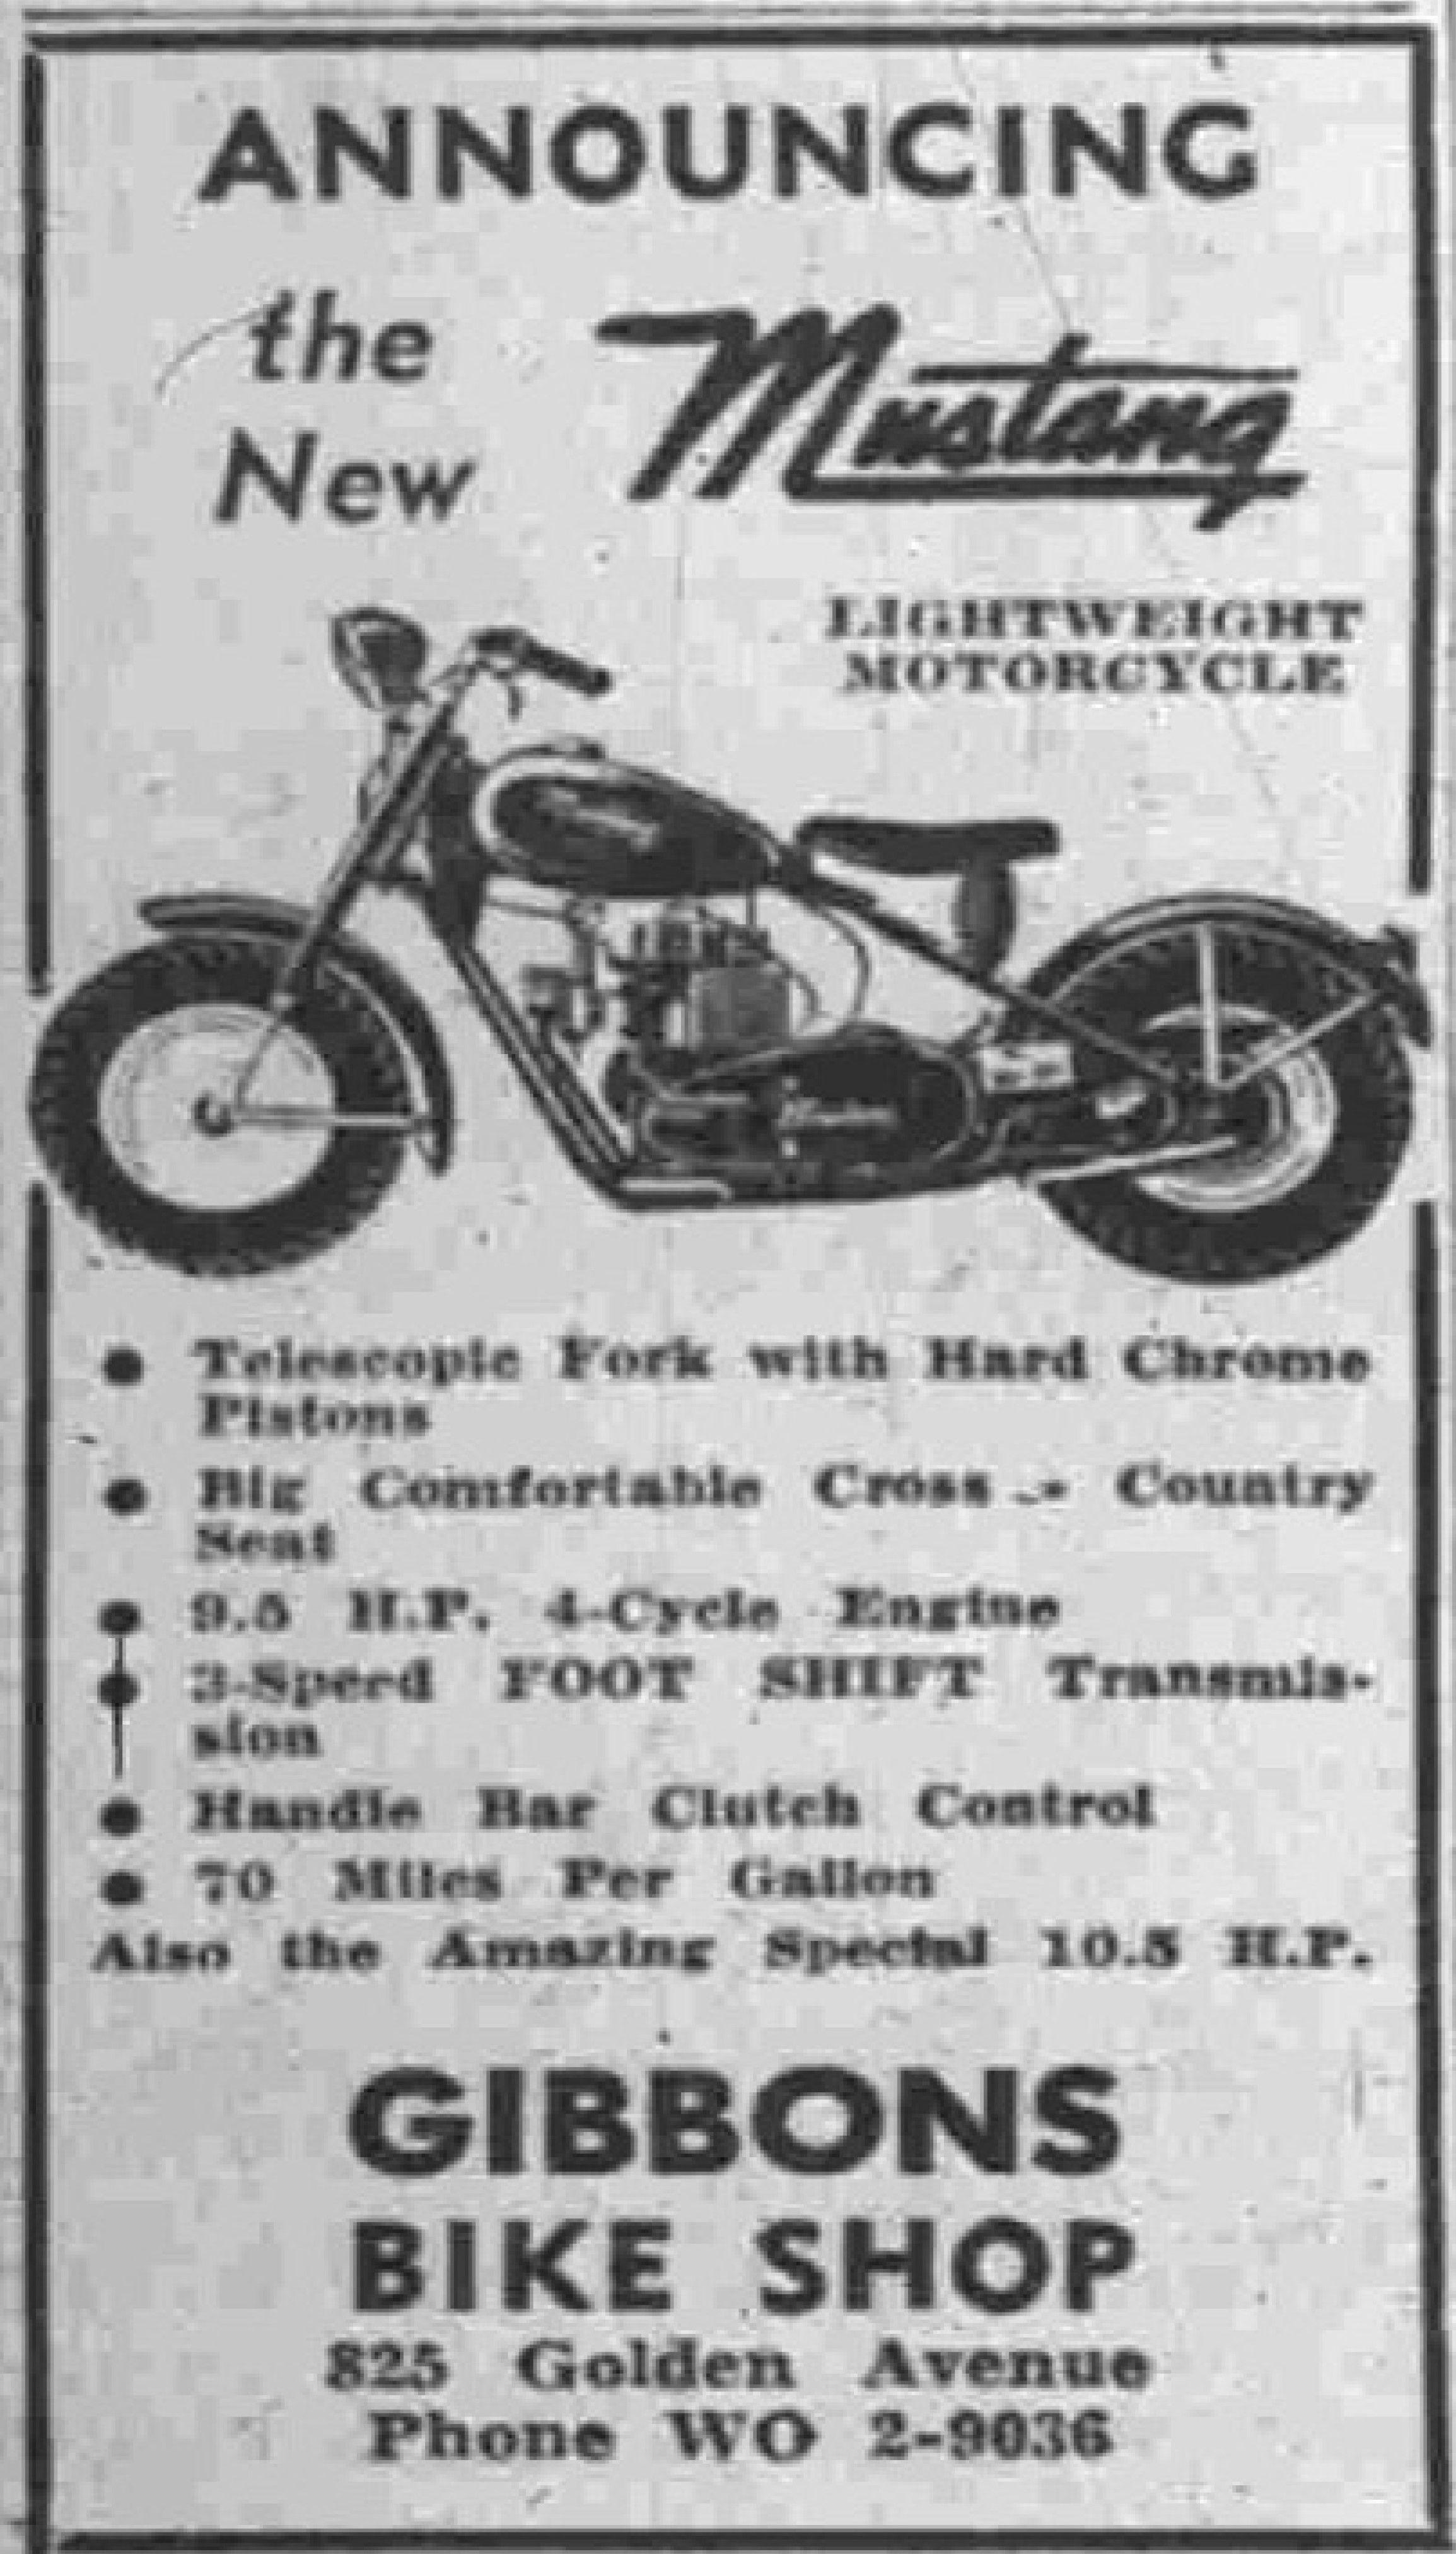 Gibbons Bike Shop Battle Creek Michigan Mustang Lightweight